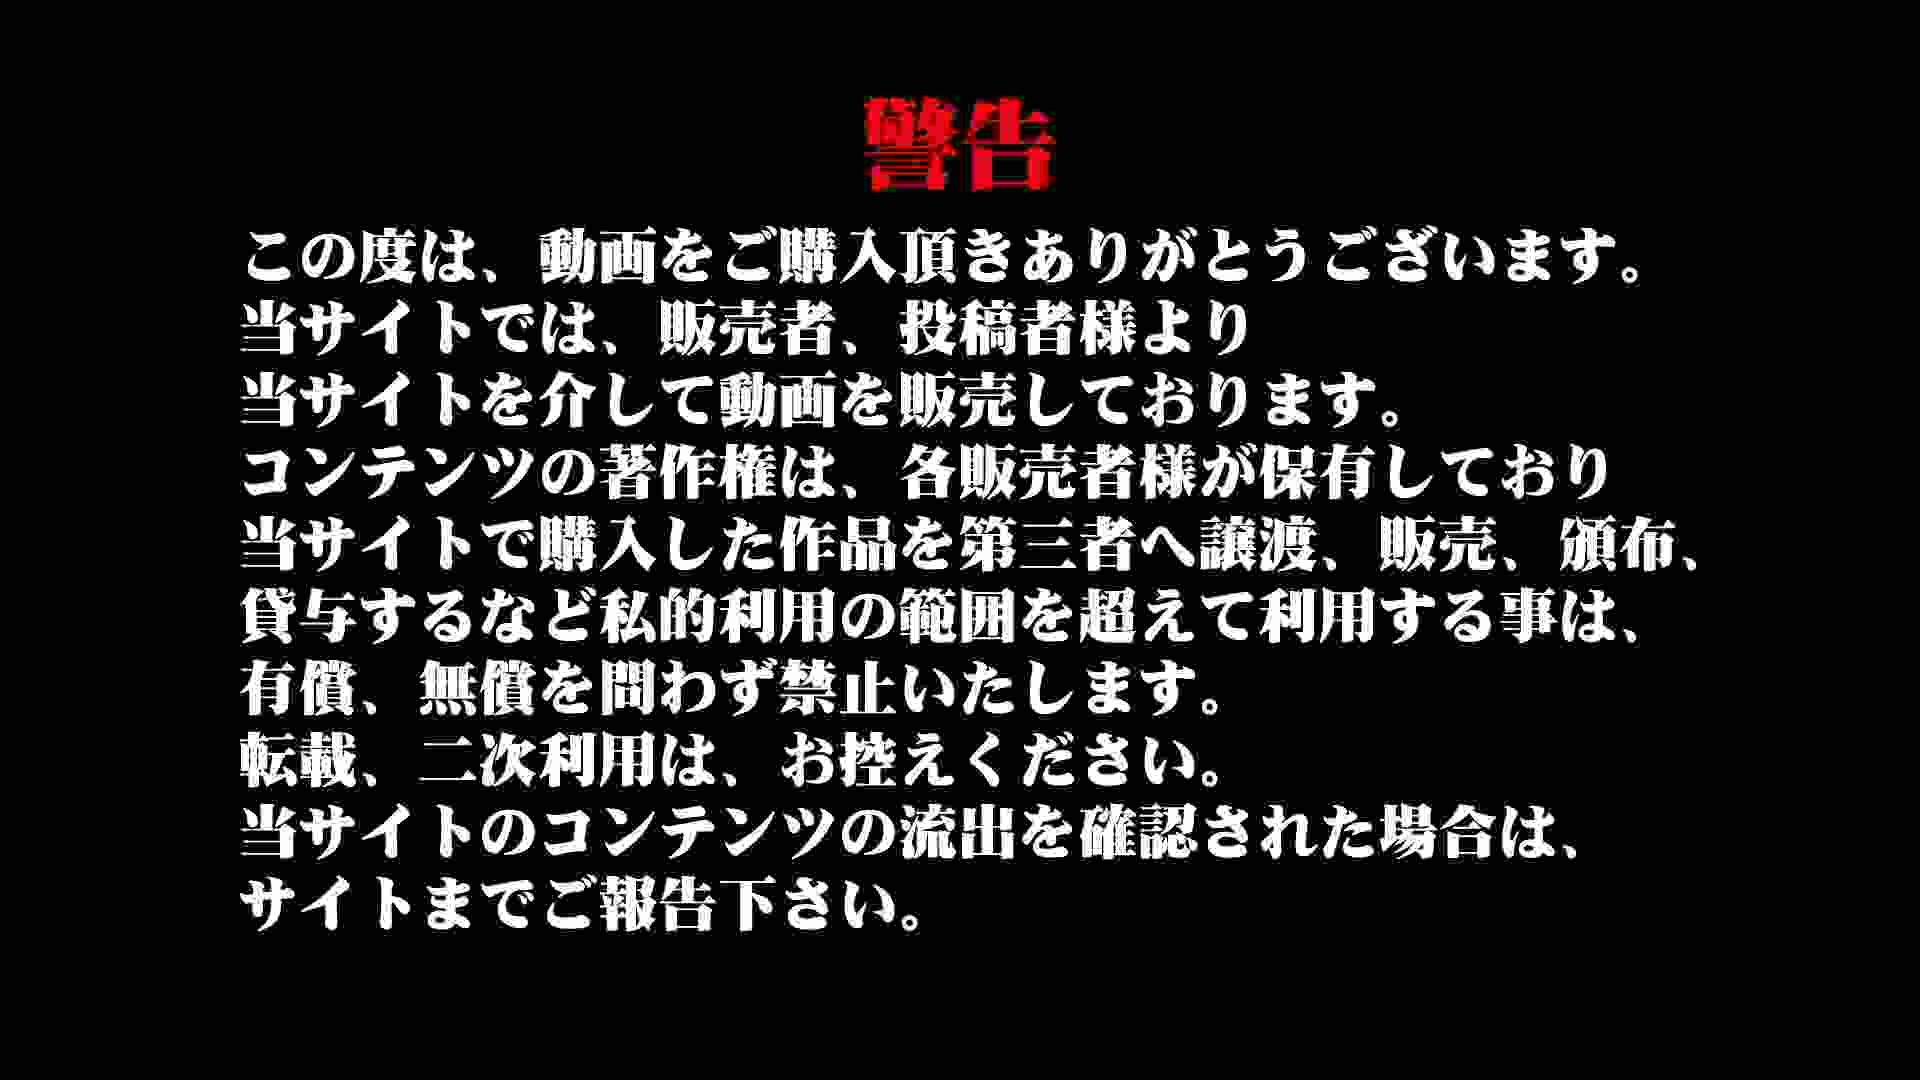 Aquaな露天風呂Vol.920 盗撮シリーズ | 露天風呂編  89PIX 1